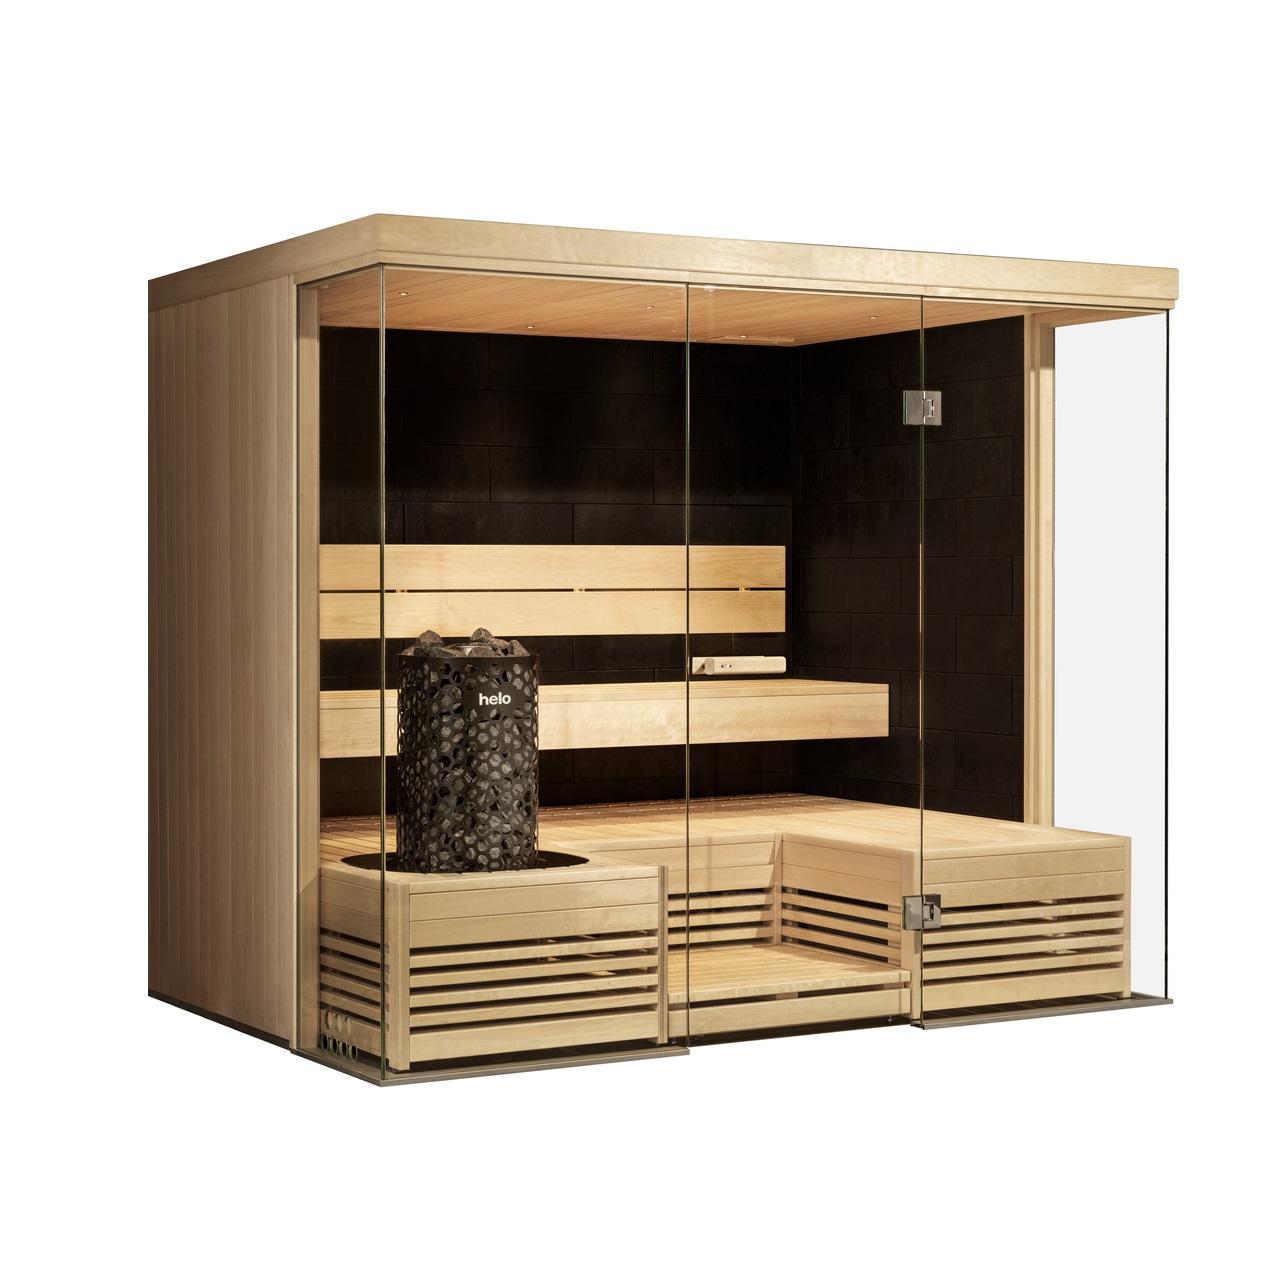 Harmony Glass Corner with Taika panel and Himalaya heater